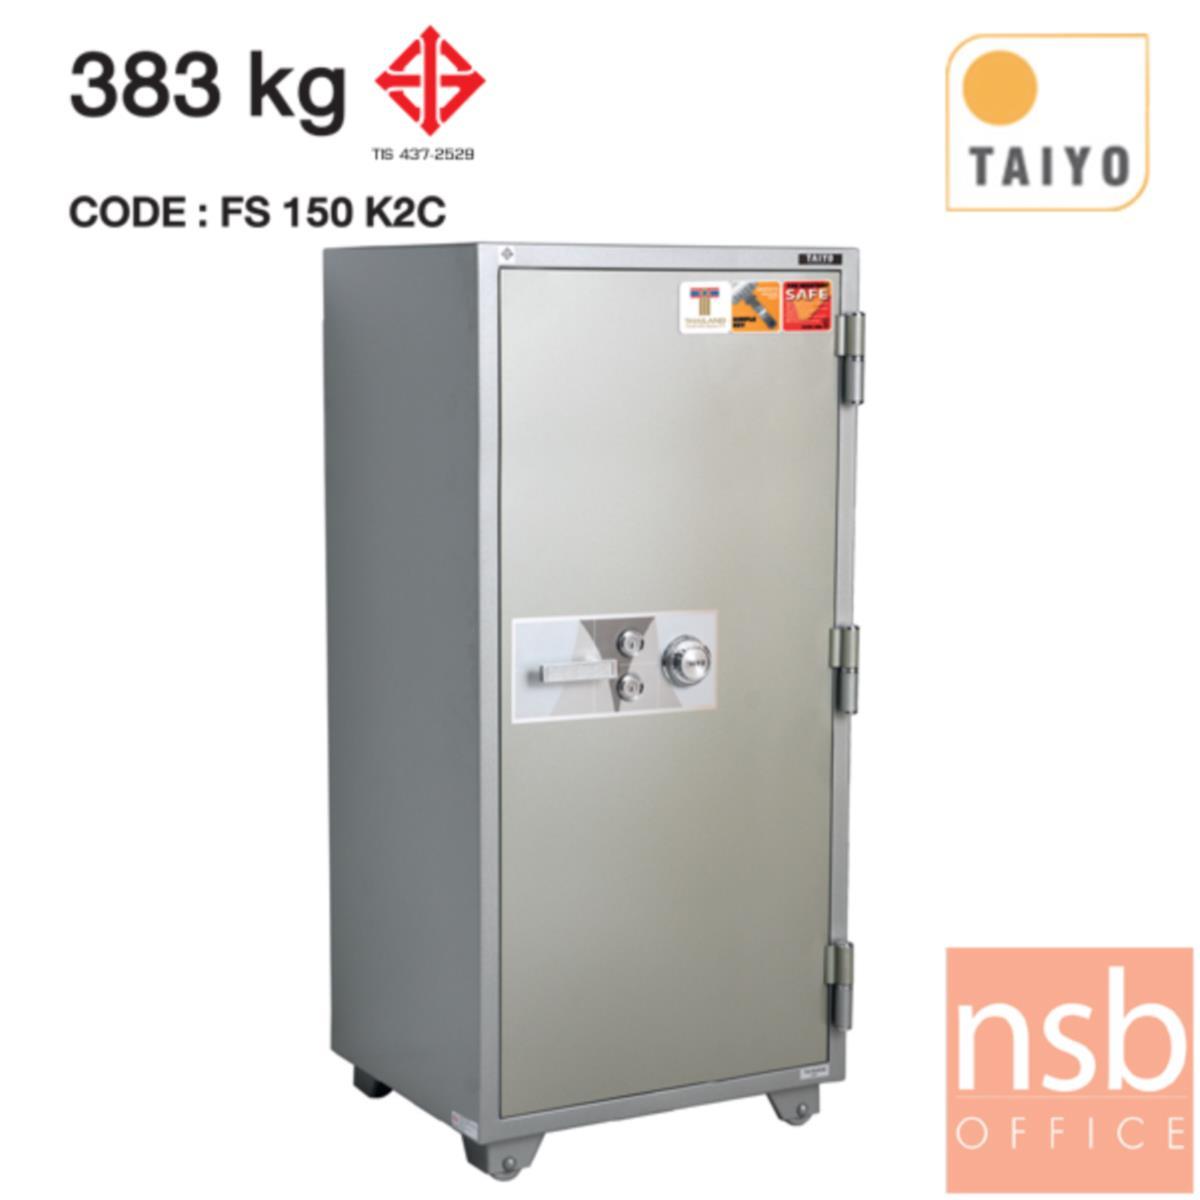 F01A034:TAIYO Hanging File 383 กก.    2 กุญแจ 1 รหัส (FS 150 K2C มอก.)